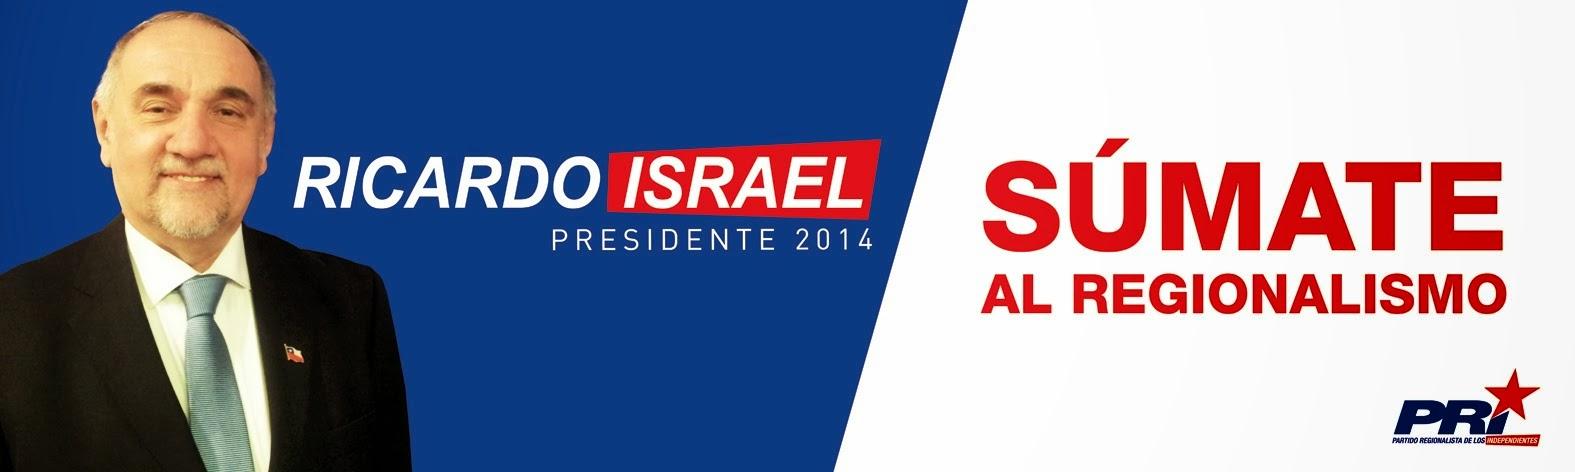 Ricardo Israel Presidente 2014